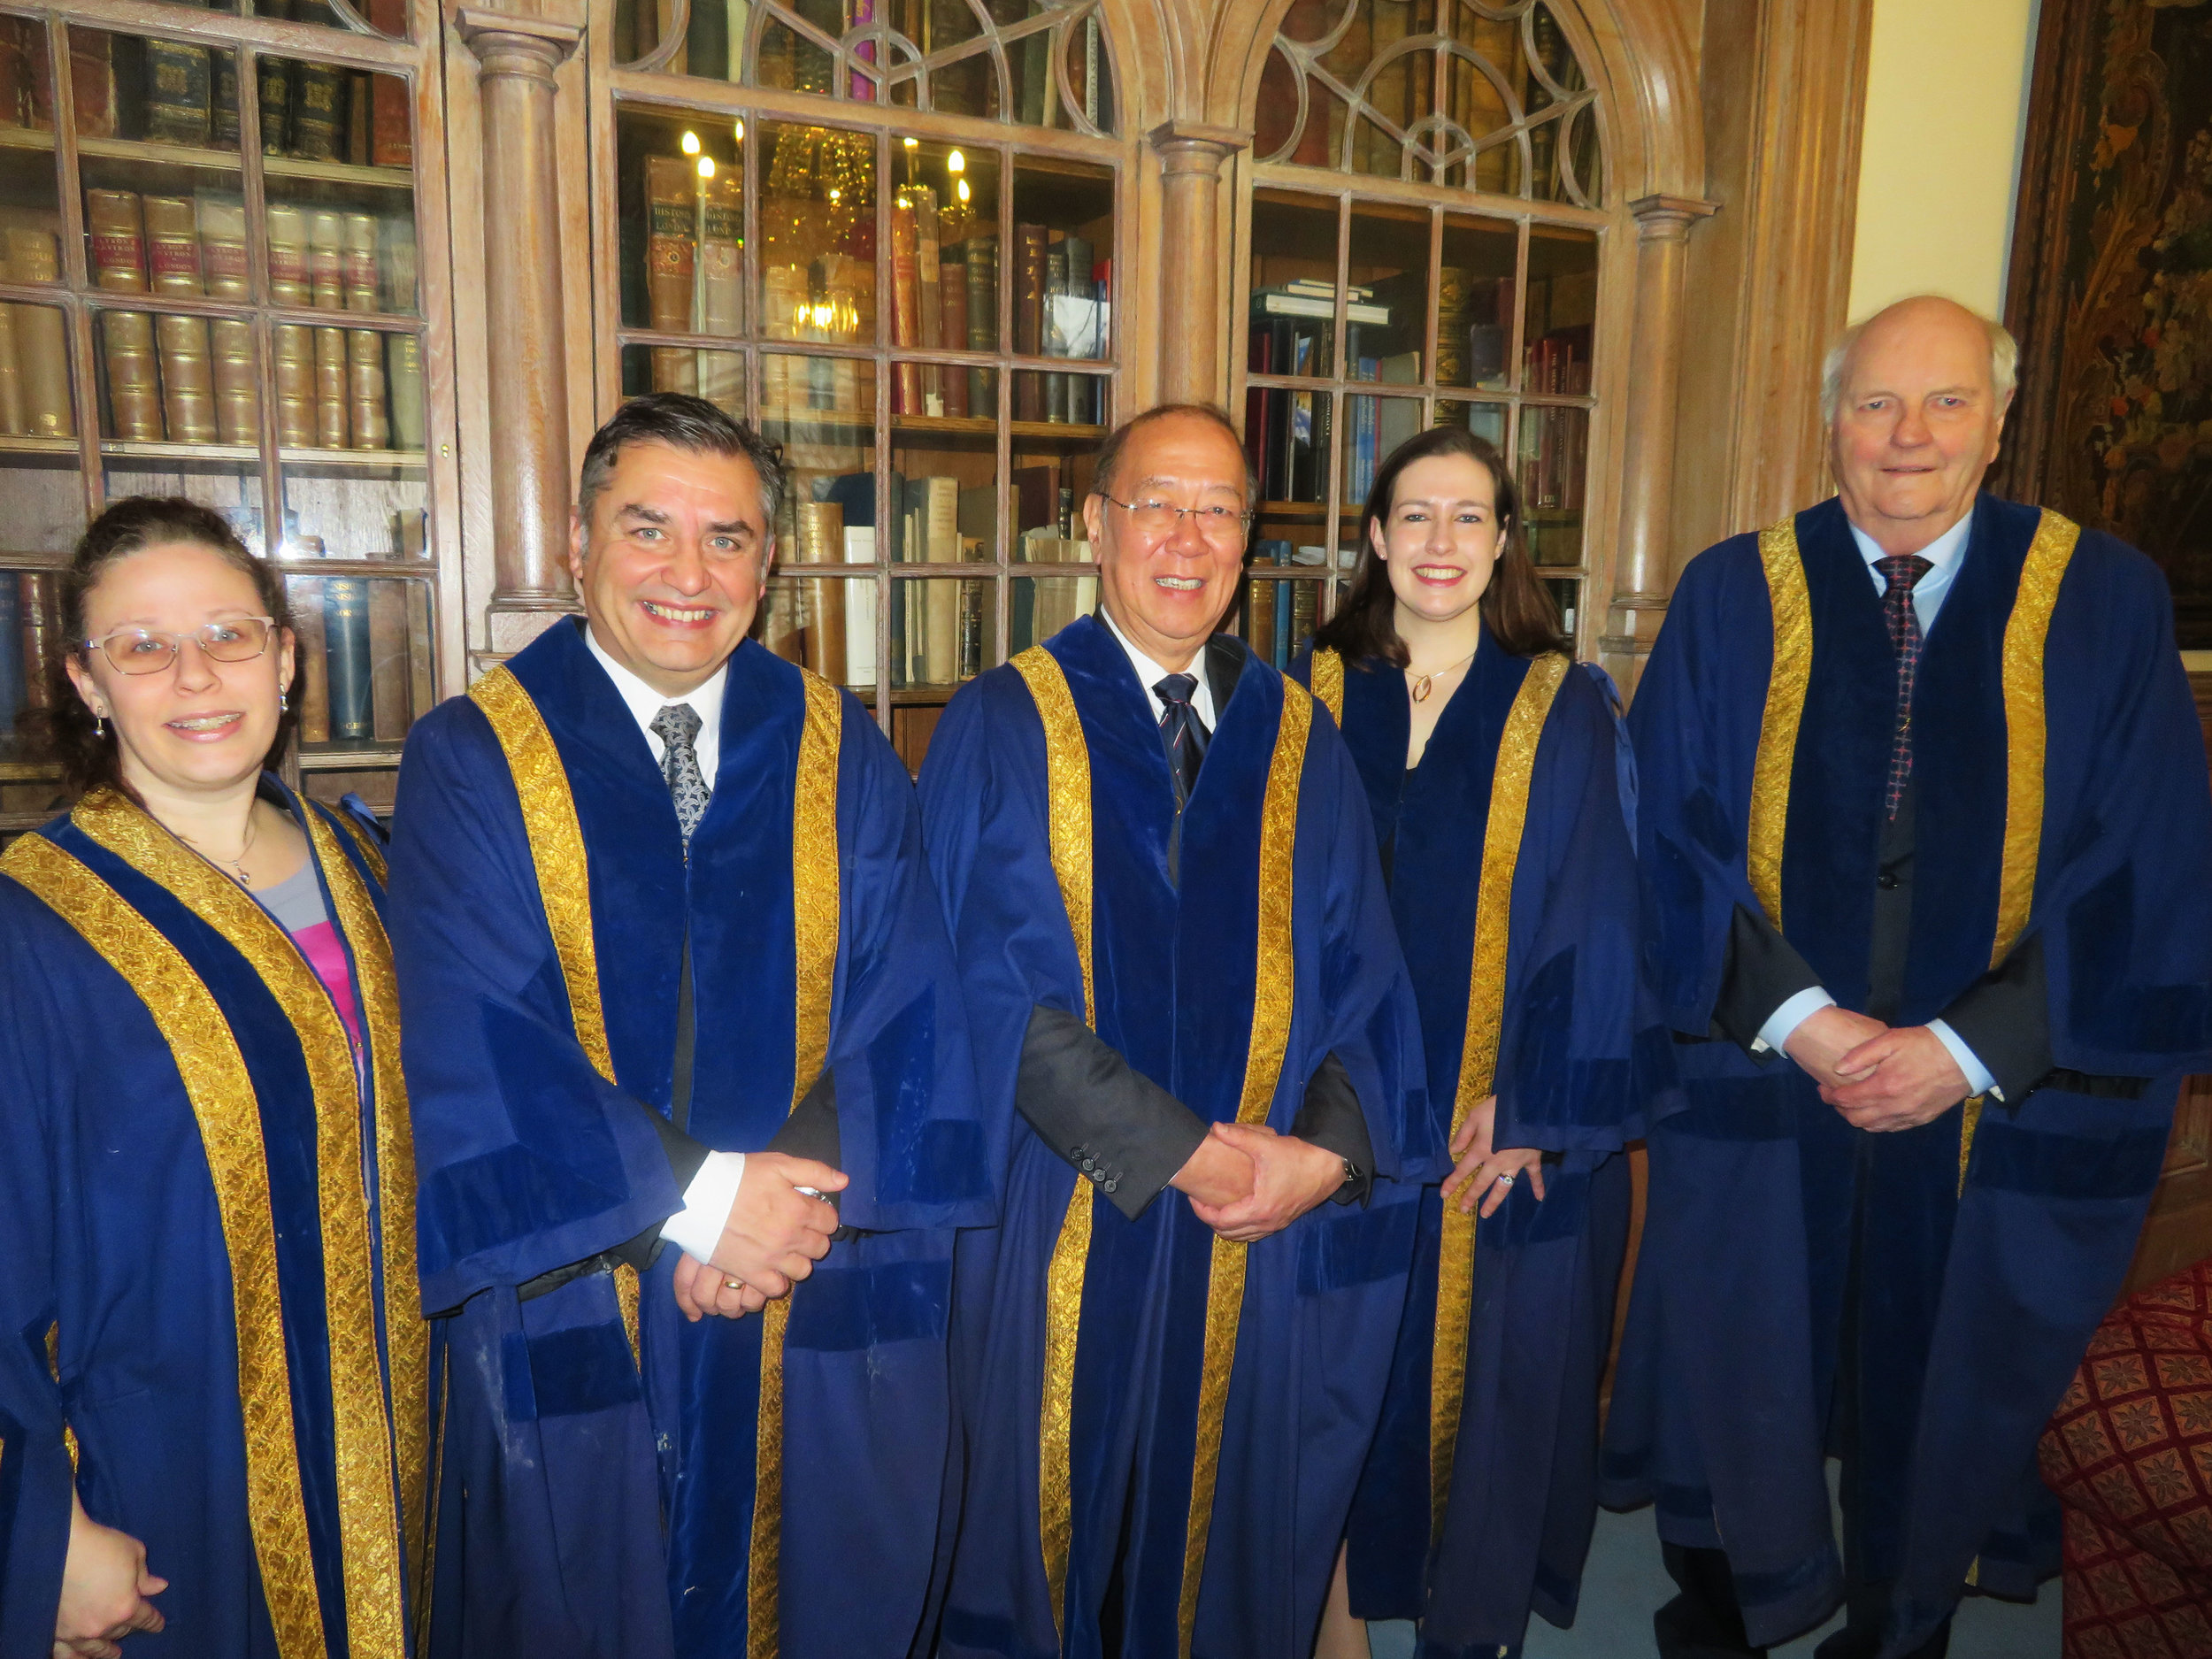 New Liverymen Karen Brewer, Sean Eley, Ronald Ng, Laura Warren & Alistair Whitehead